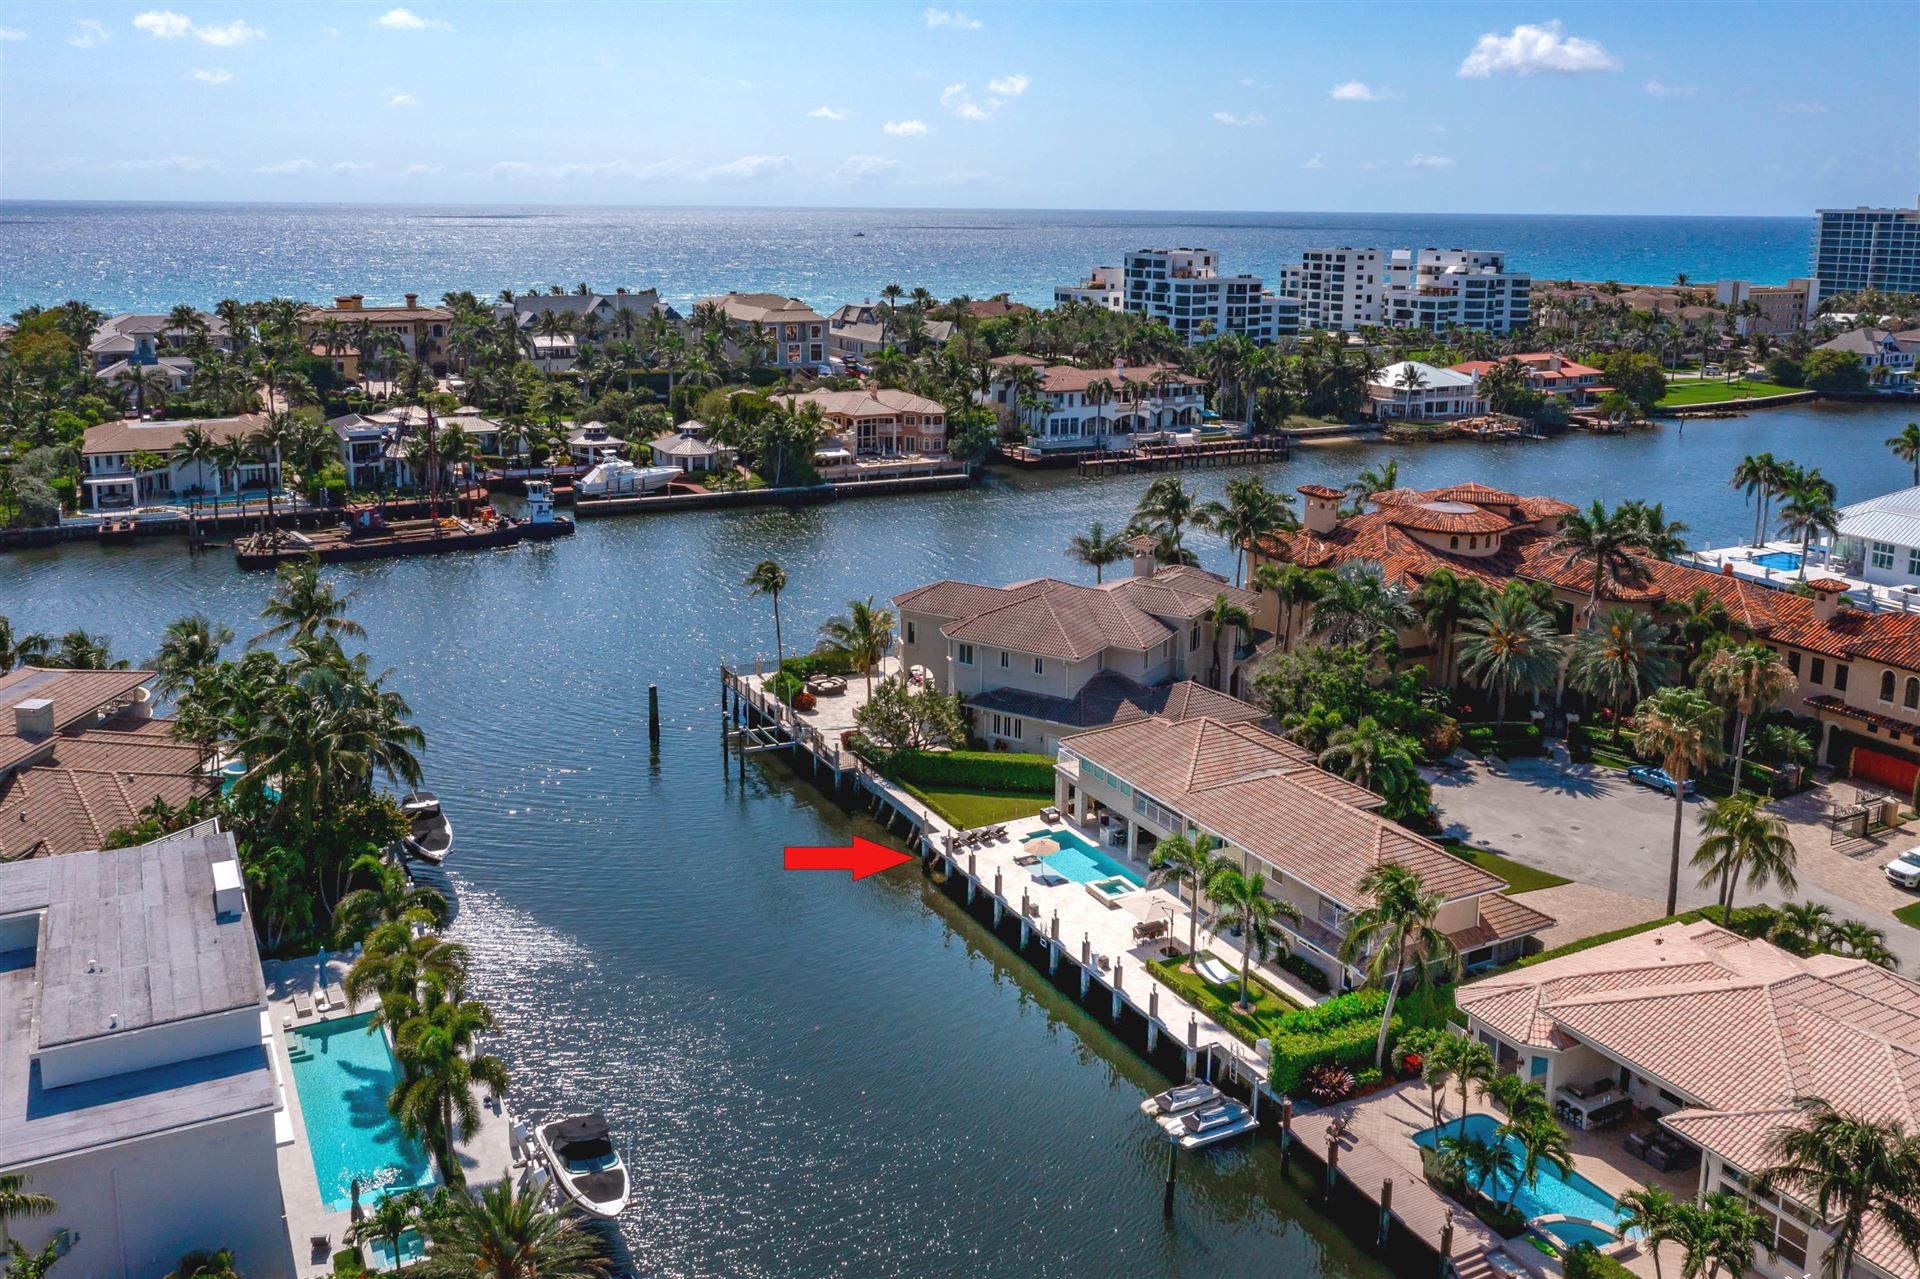 959 Gardenia Drive, Delray Beach, FL 33483 - MLS#: RX-10714314